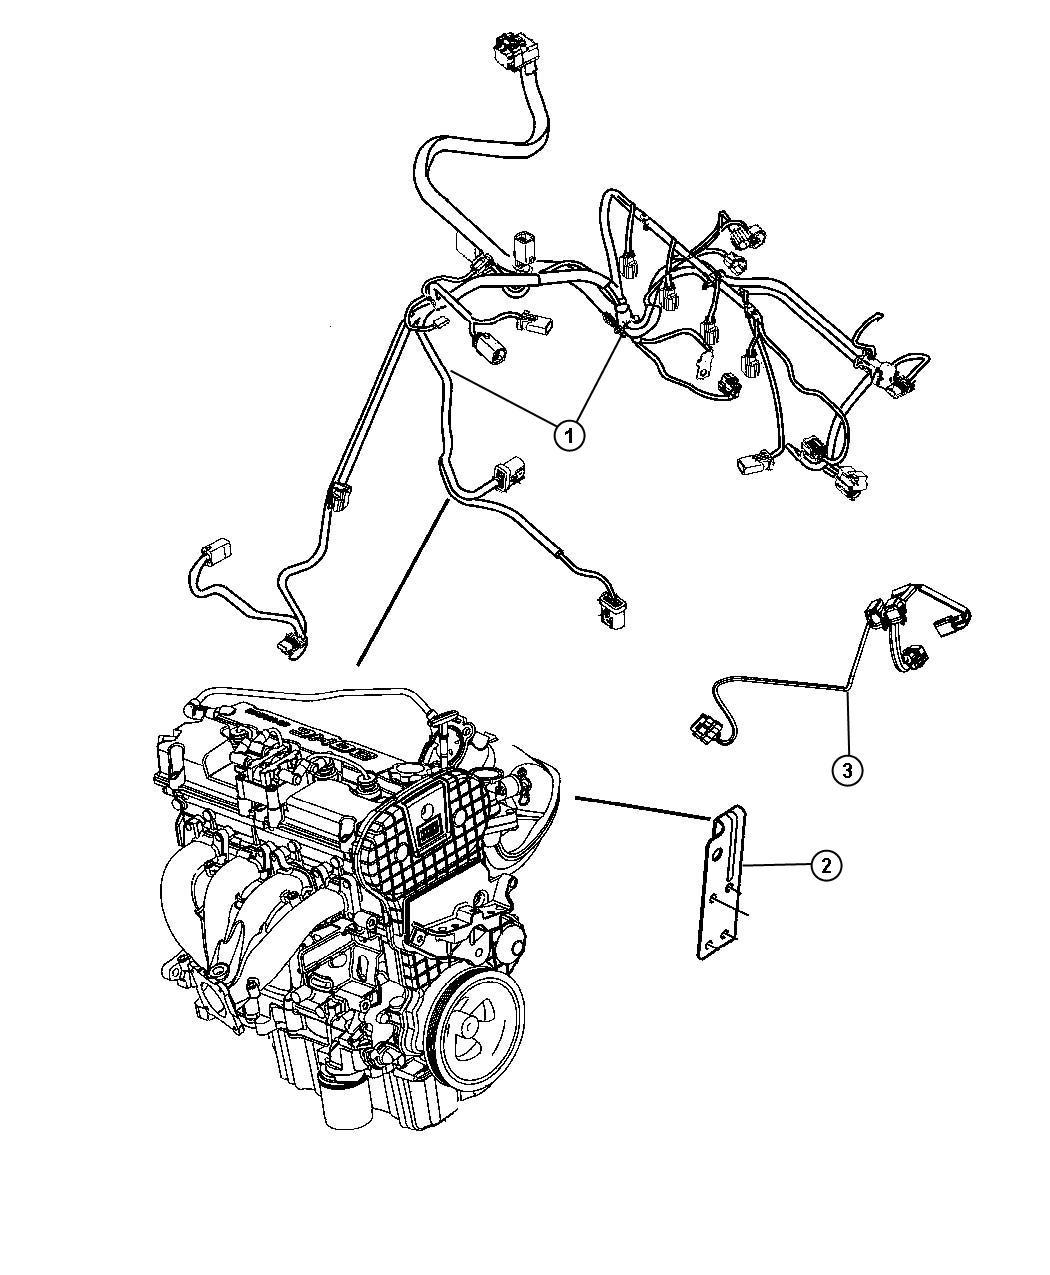 Chrysler Sebring Wiring Engine Vvt Dual Electrical